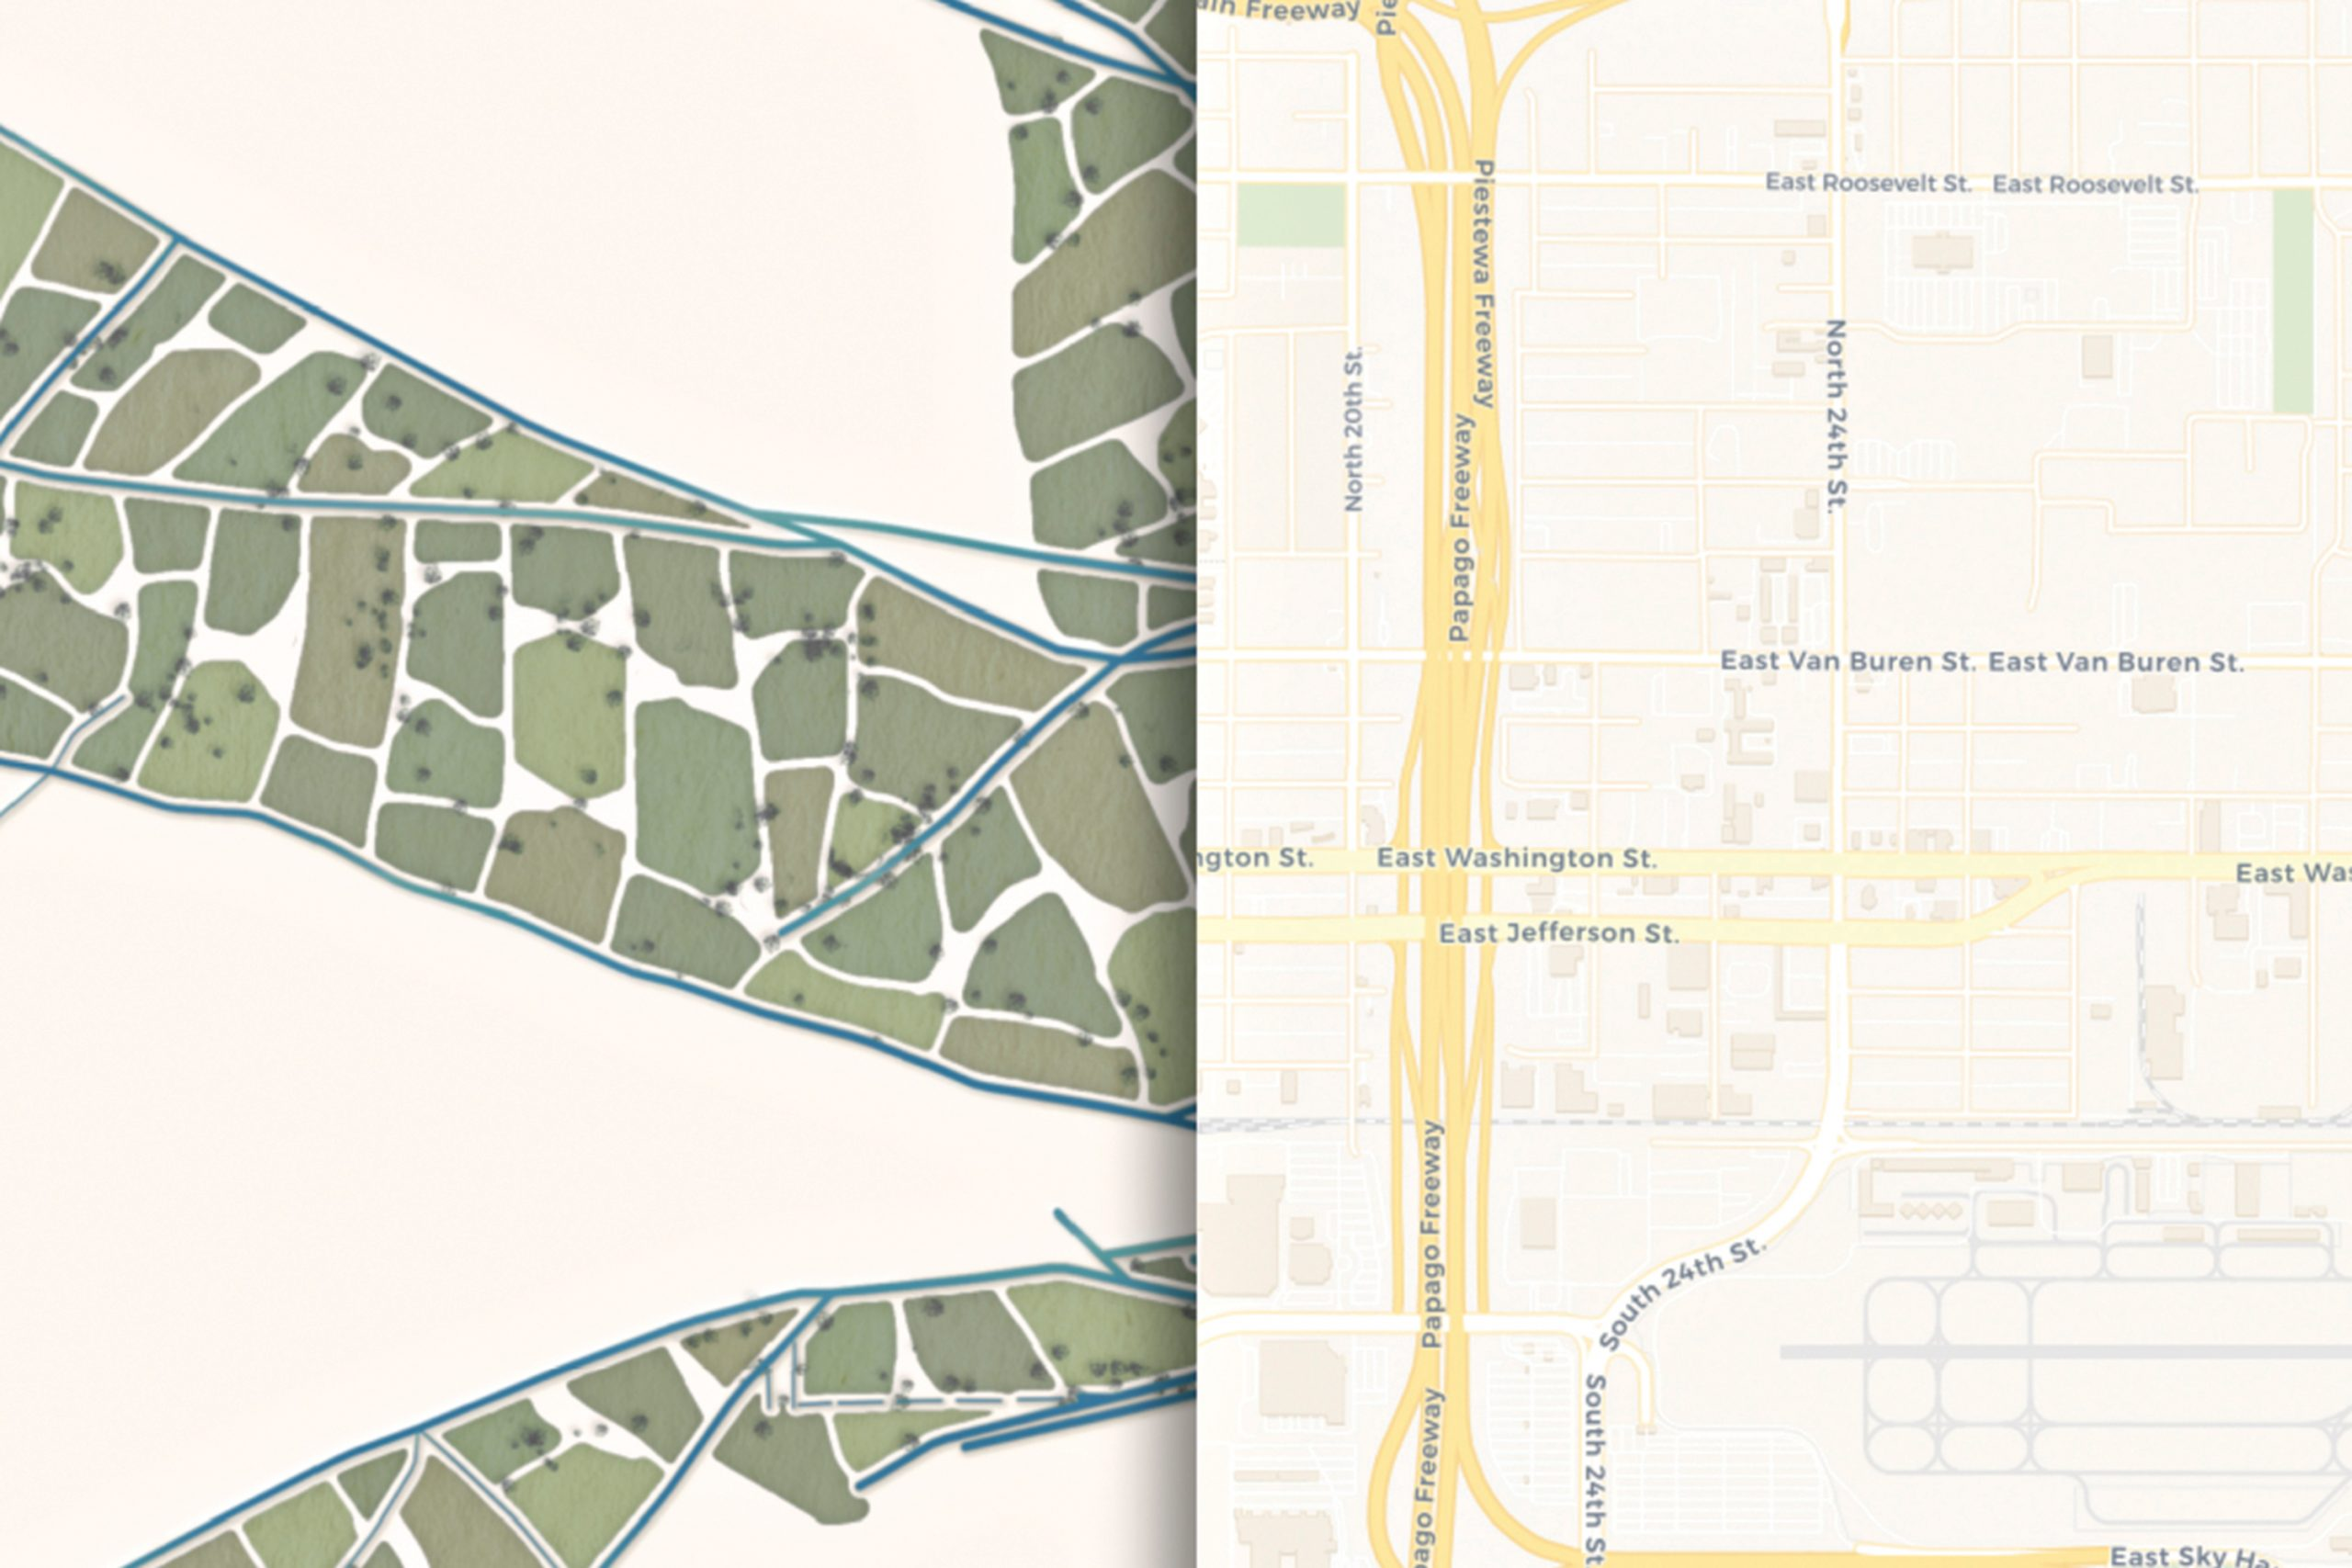 Photo courtesy A Deeper Map